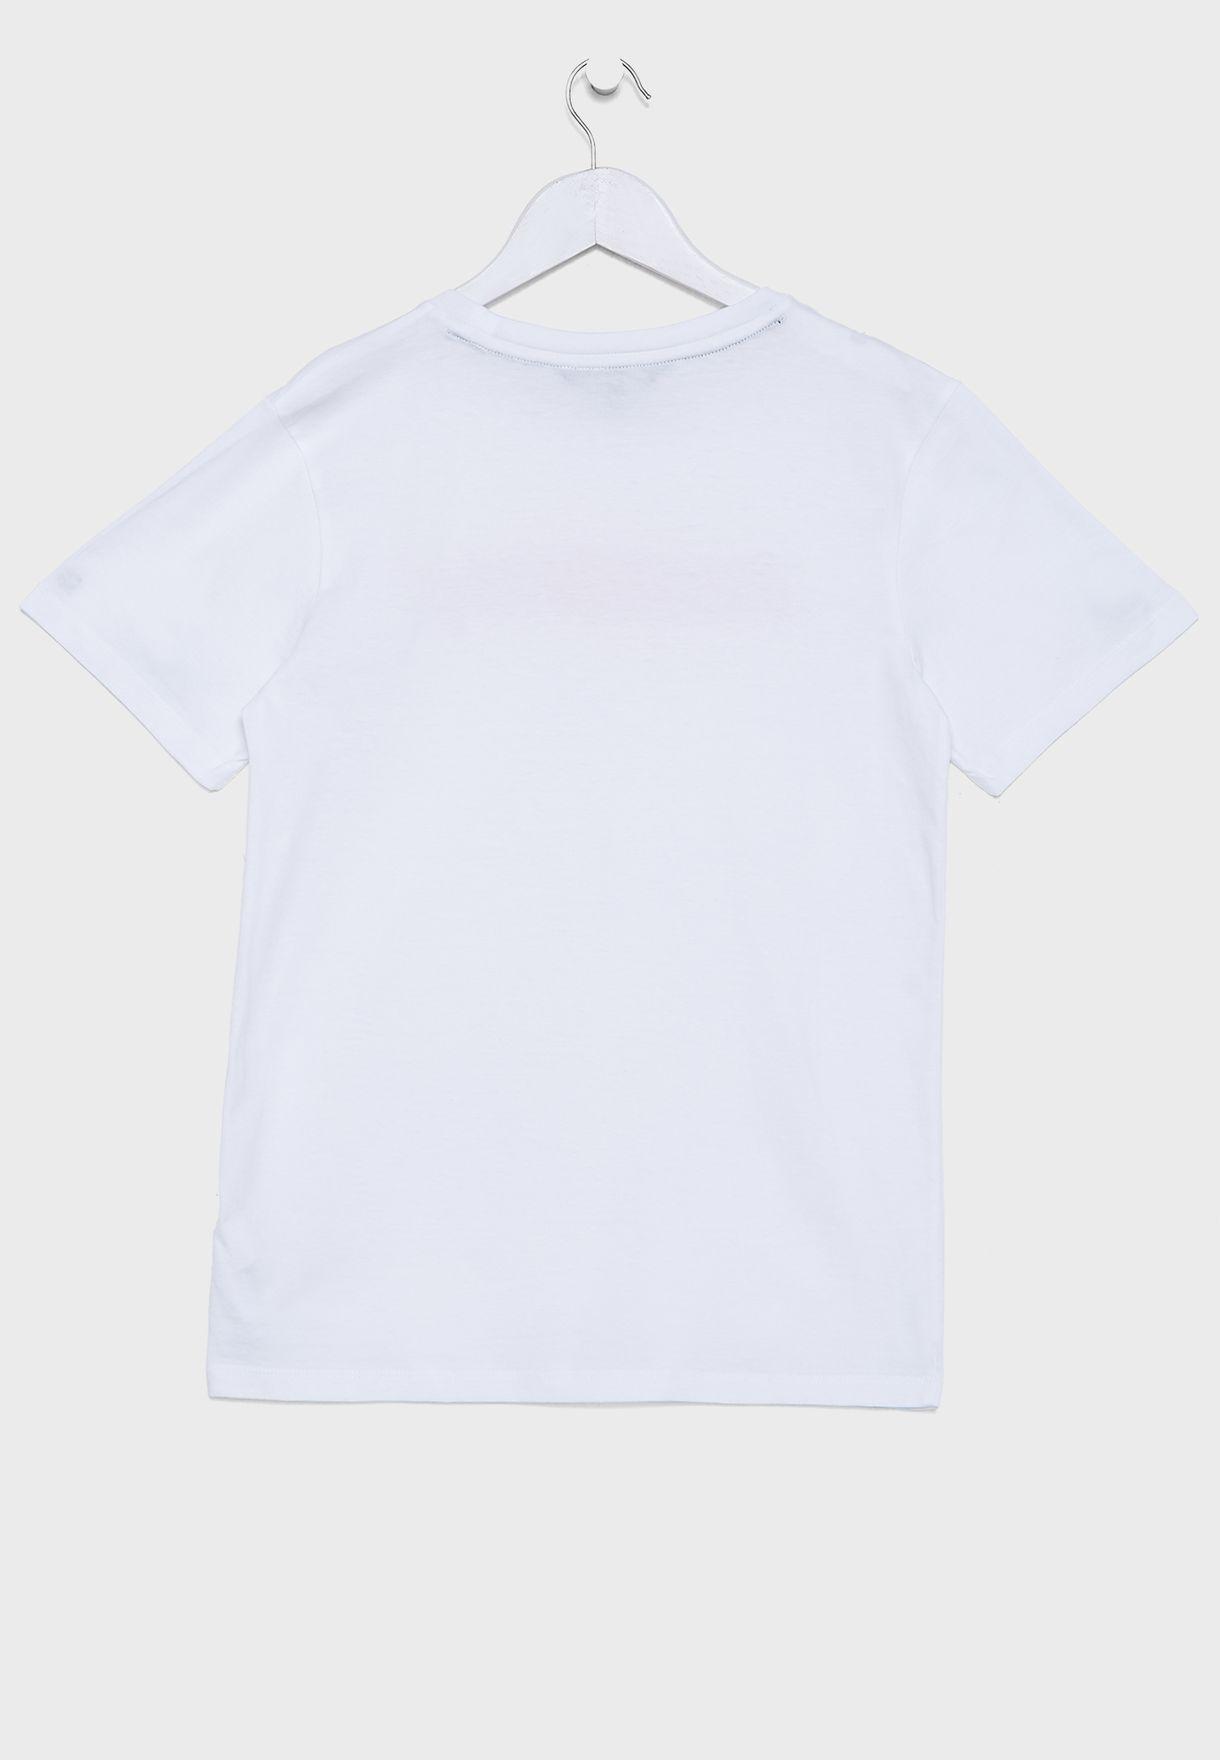 Teen Crew Neck T-Shirts